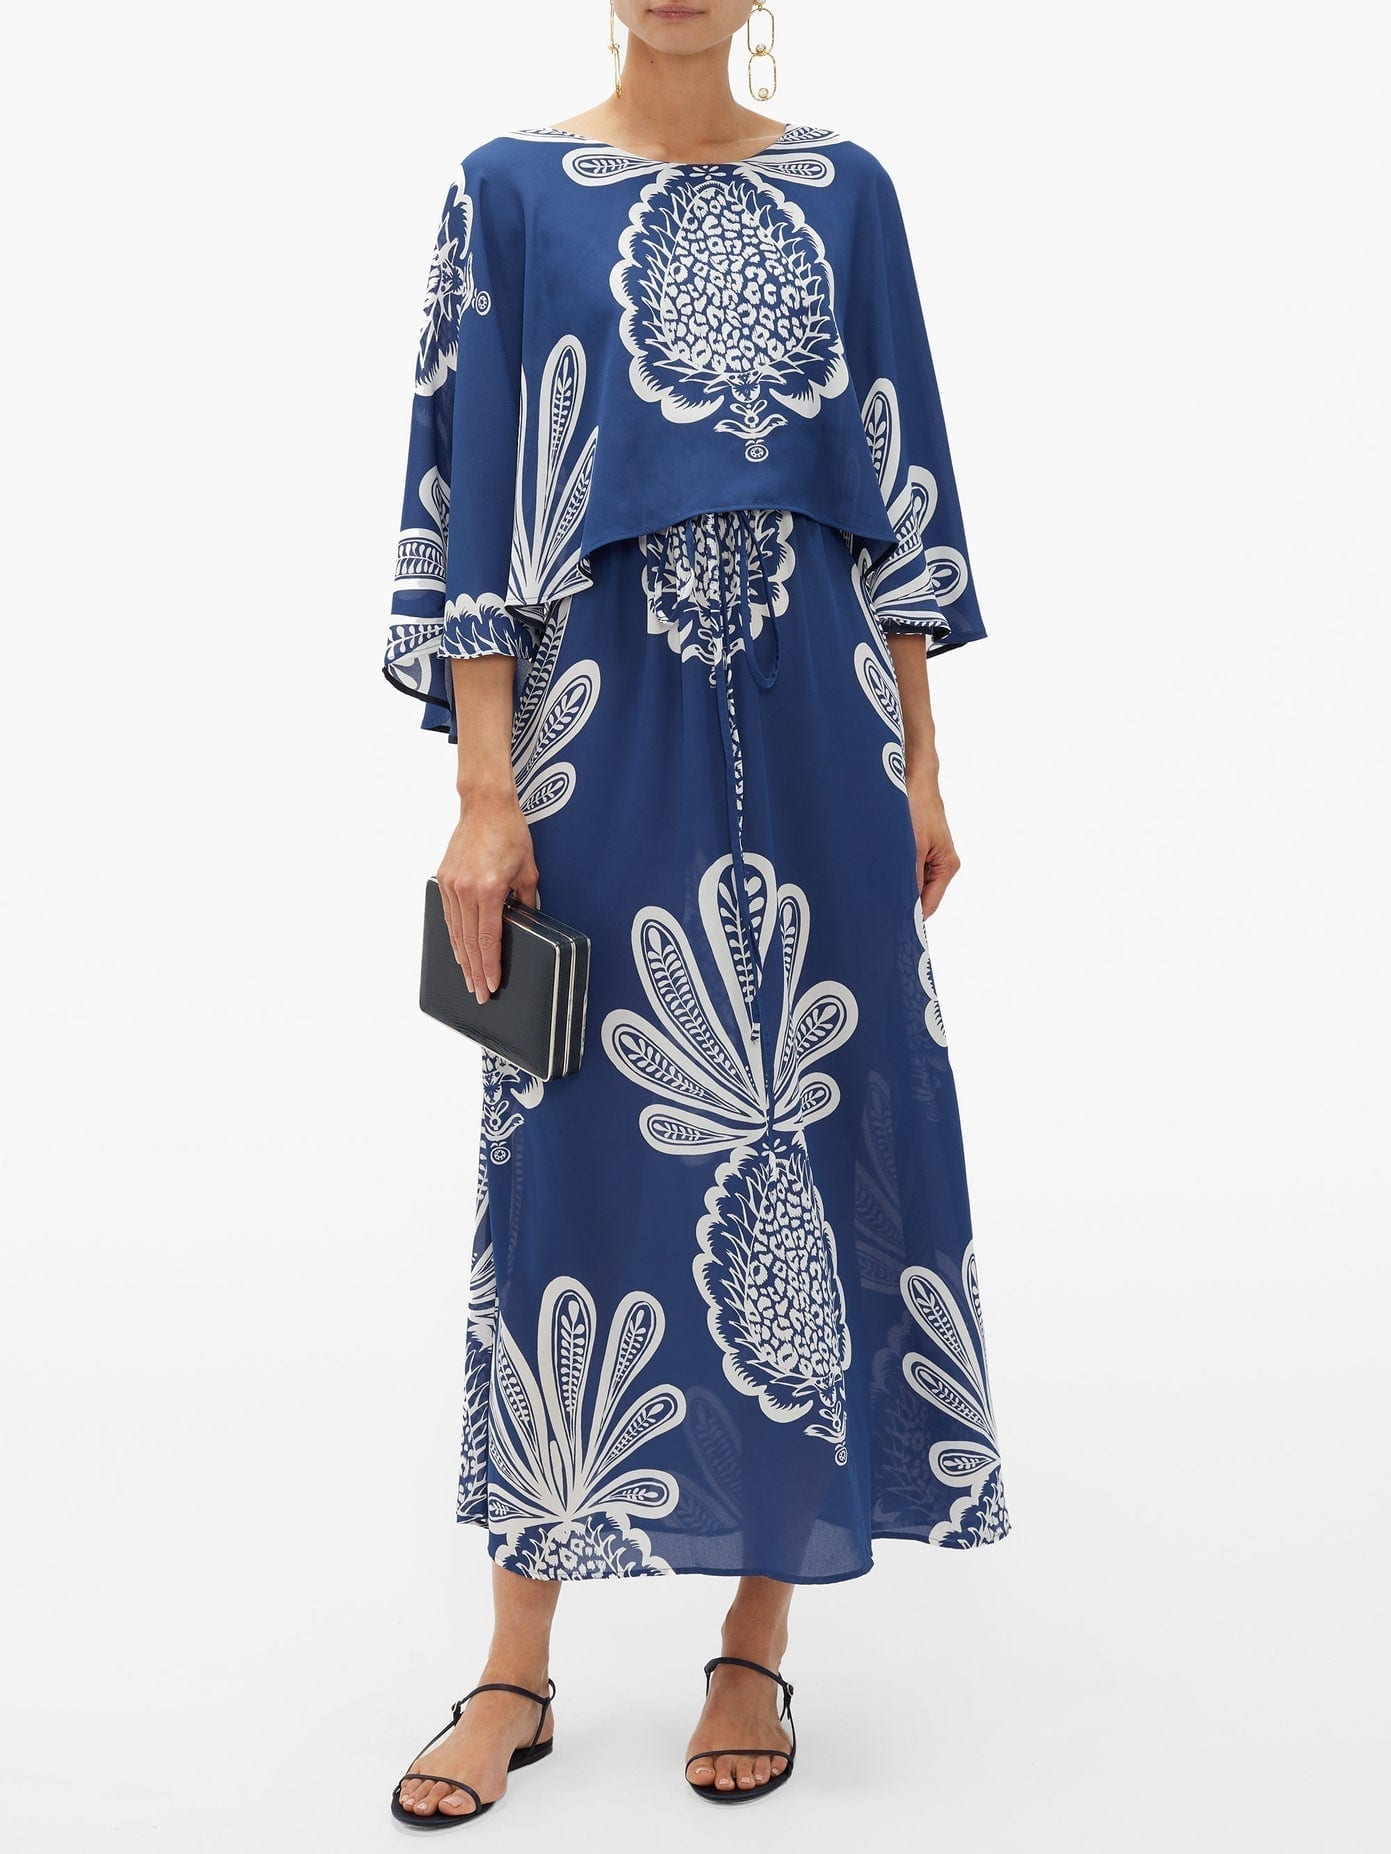 LA DOUBLEJ Bain Douche Pineapple-print Georgette Dress